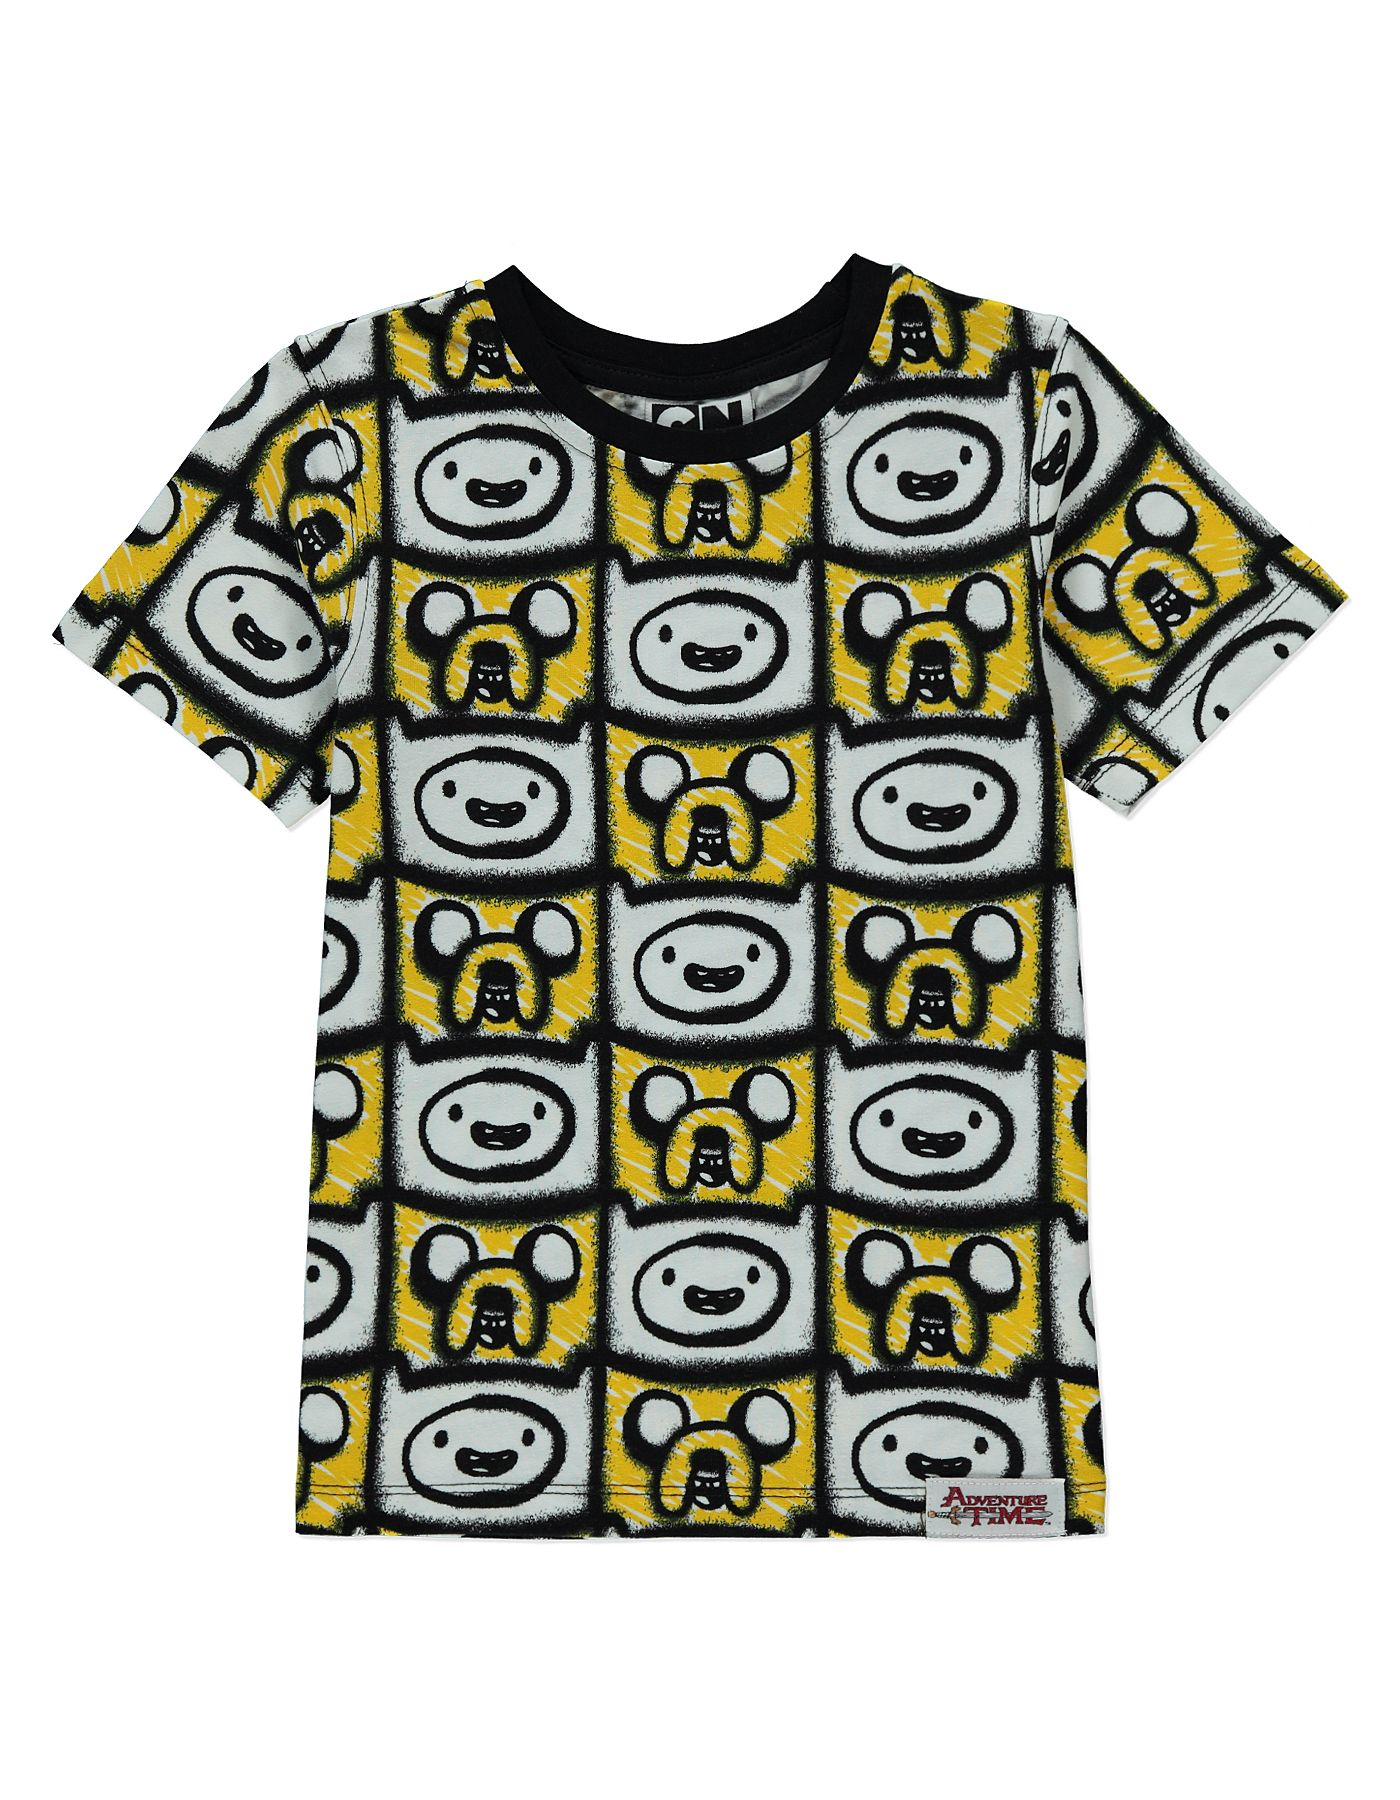 Black t shirt asda - Adventure Time T Shirt Kids George At Asda